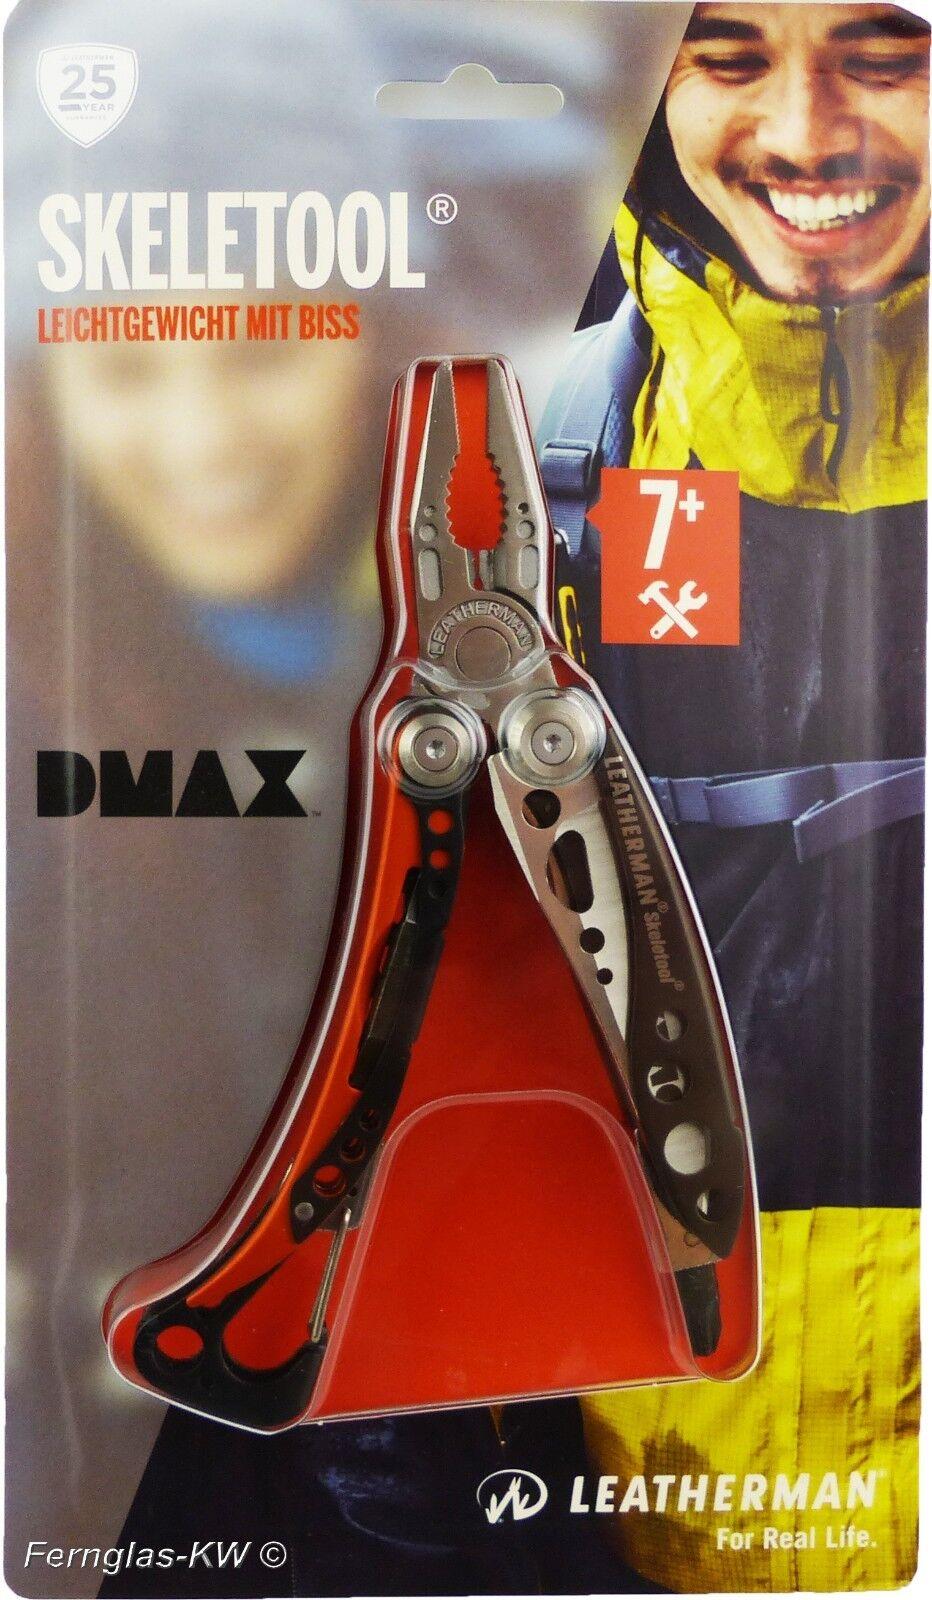 Lederman Skeletool DMAX Edition Multitool 7+ Taschenwerkzeug 142 gramm